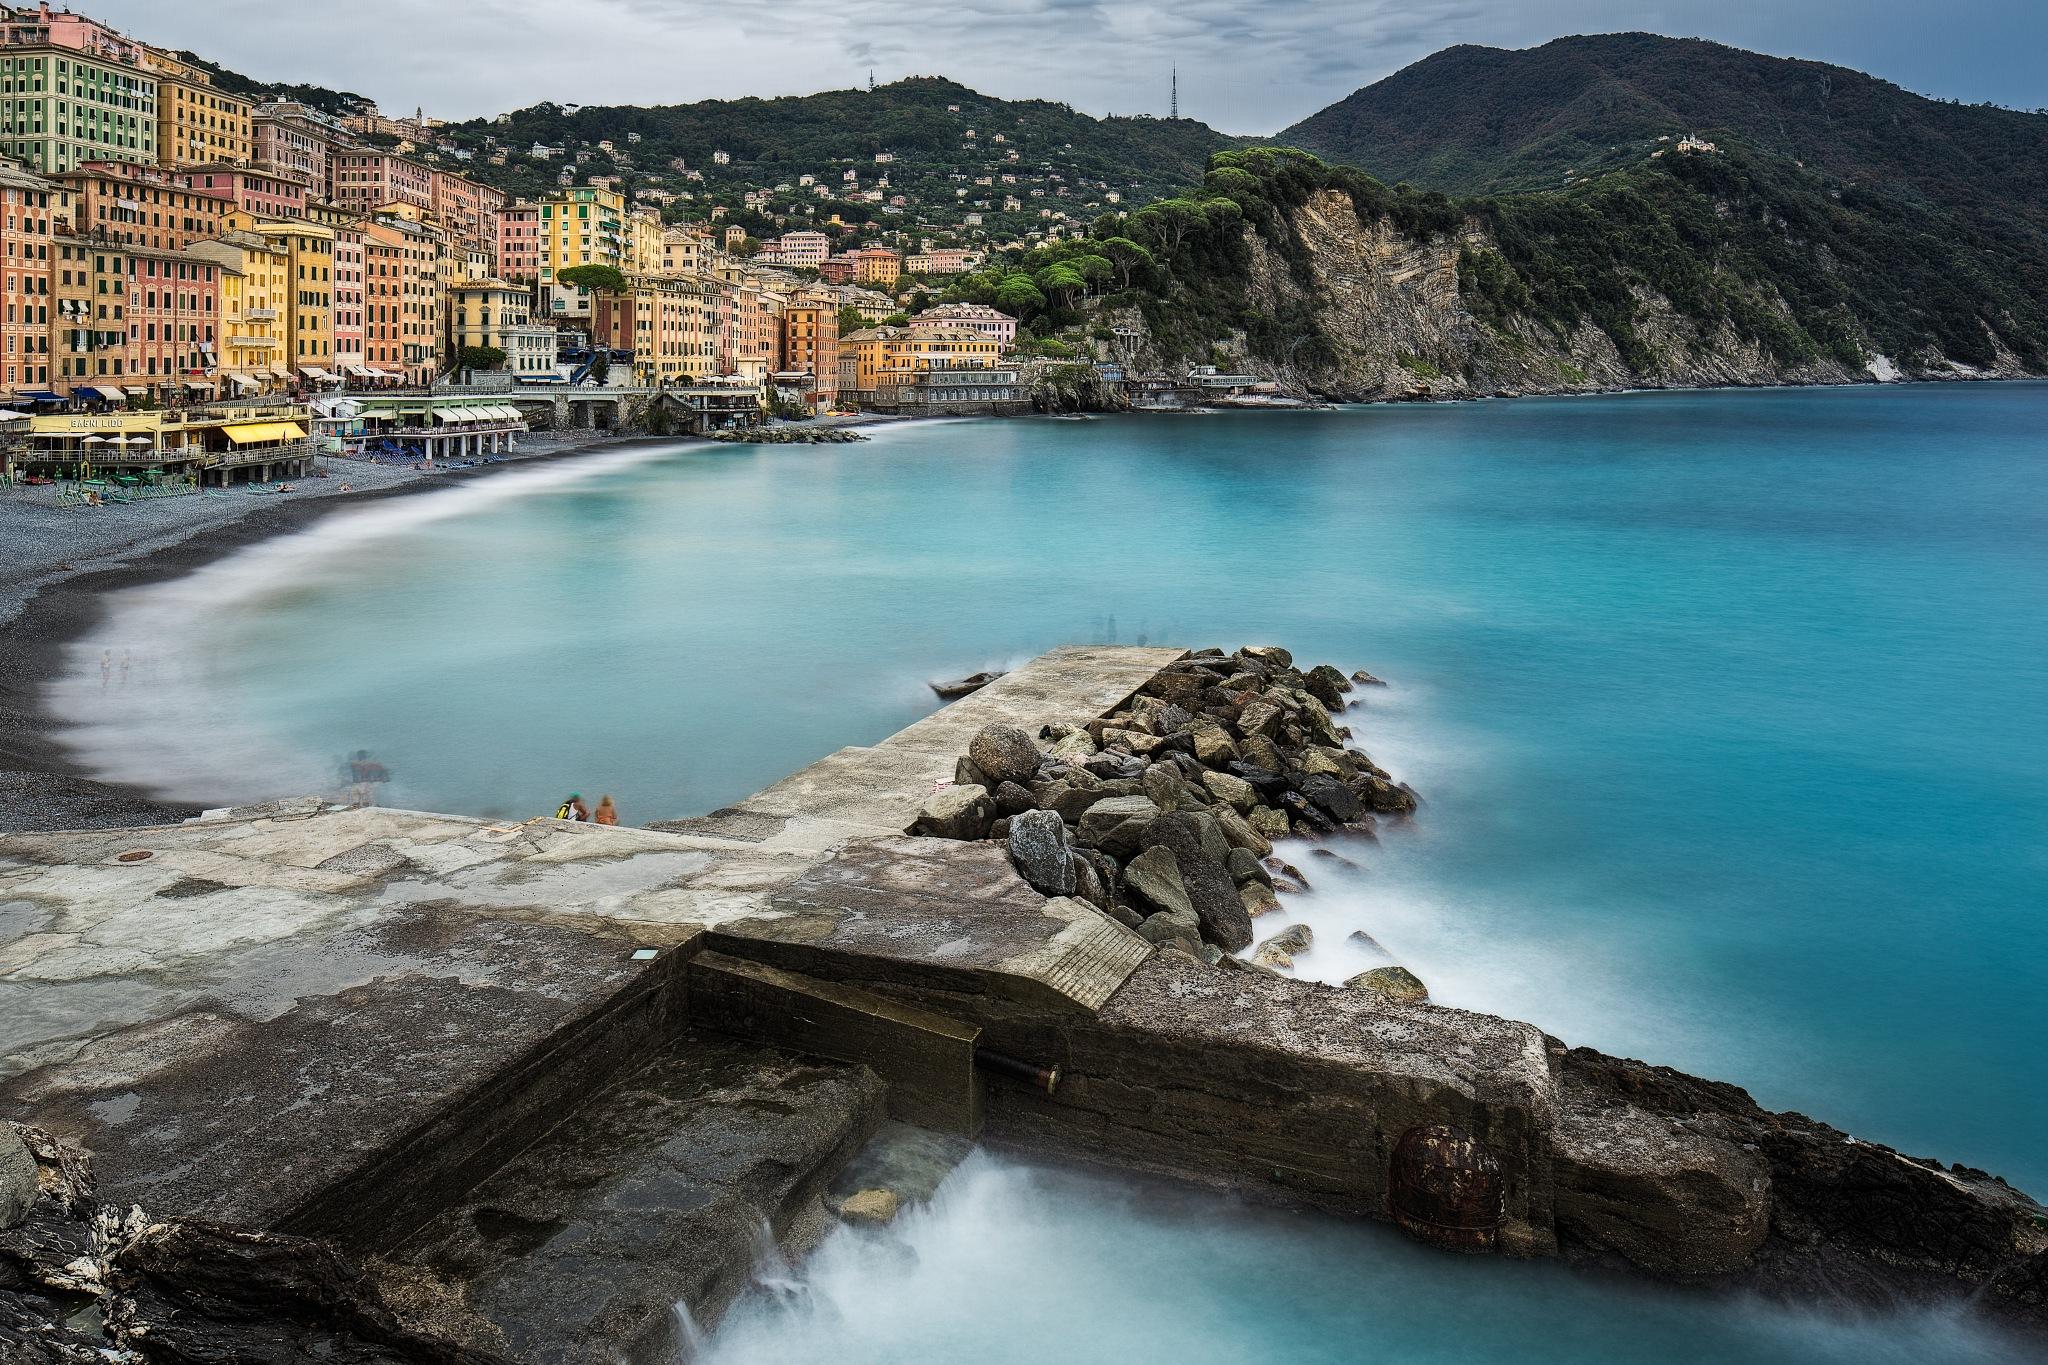 Camogli Jetty And Beach by Paul Richards